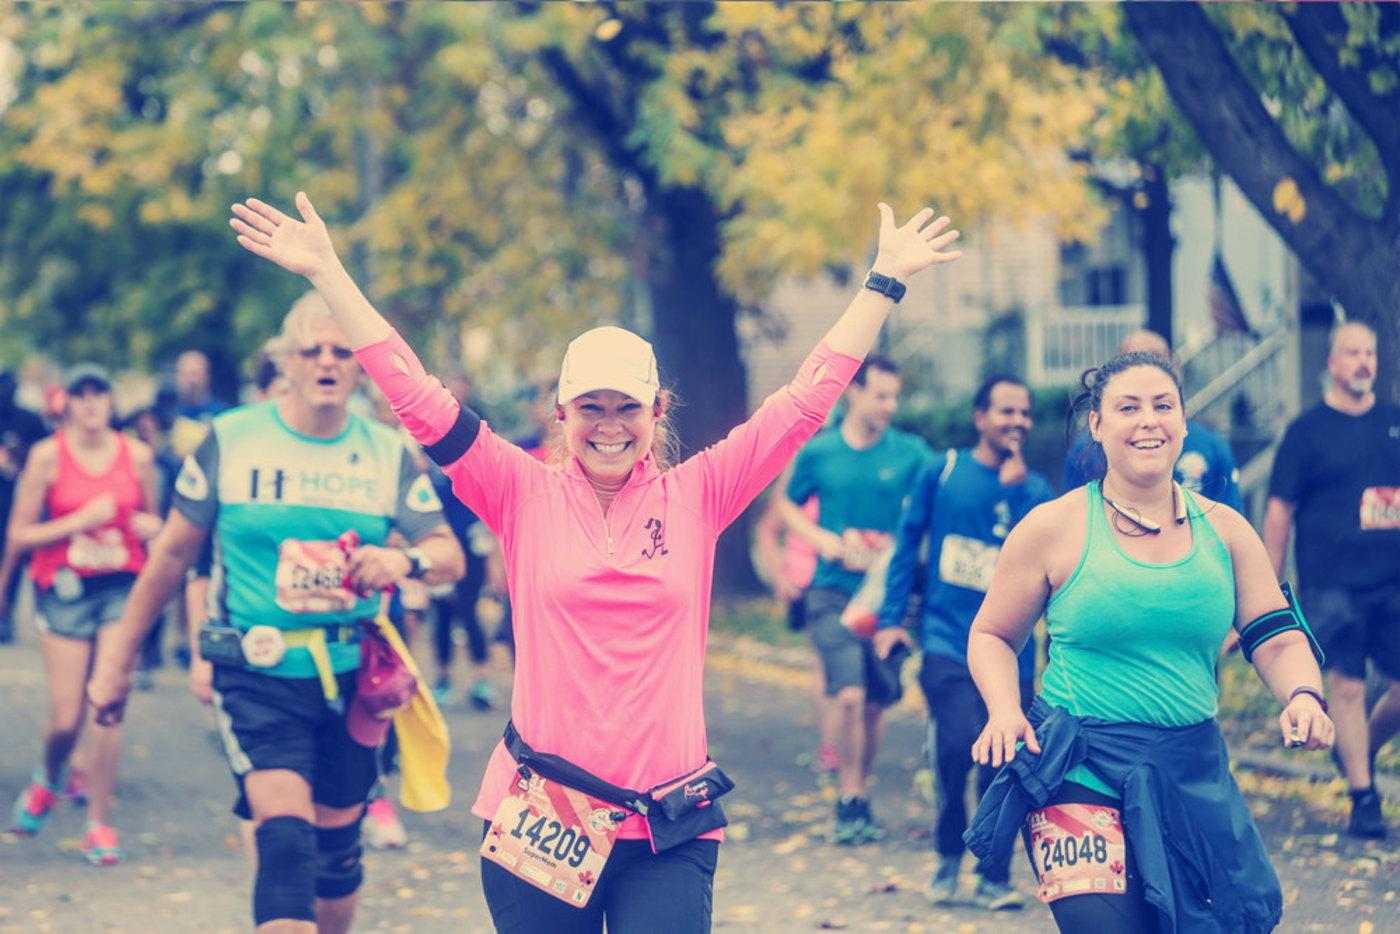 Detroit Free Press/Chemical Bank Half Marathon